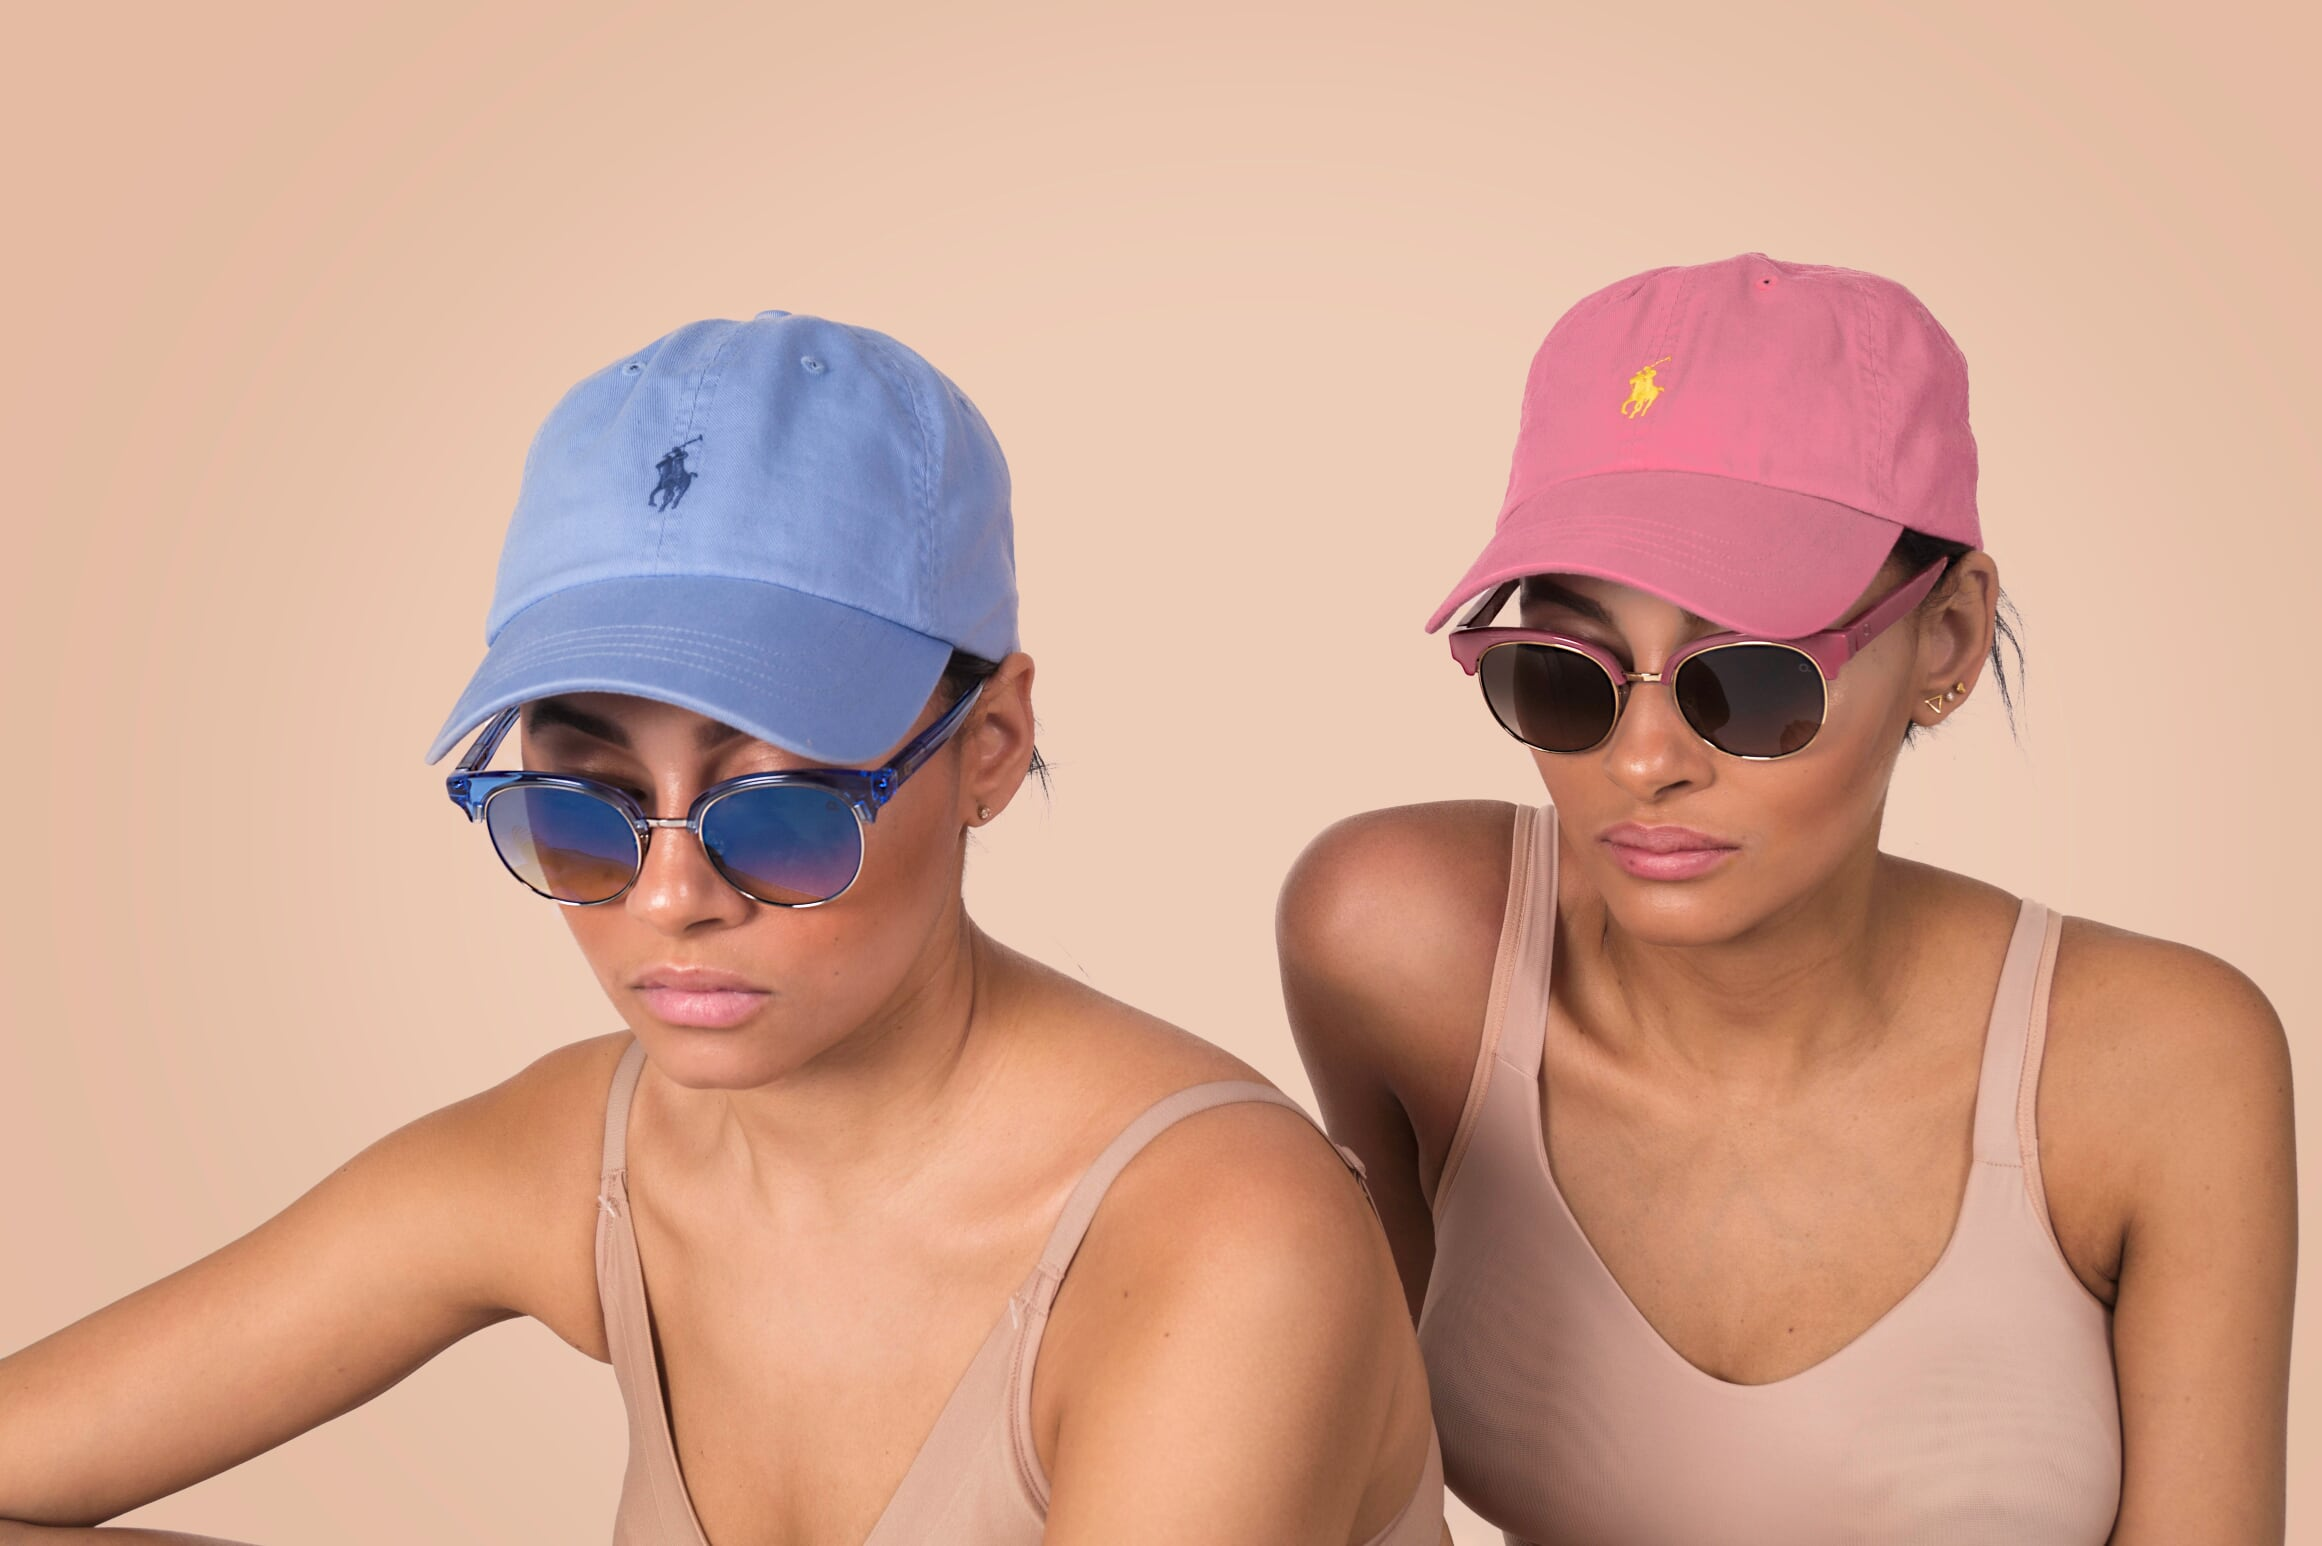 twins-01